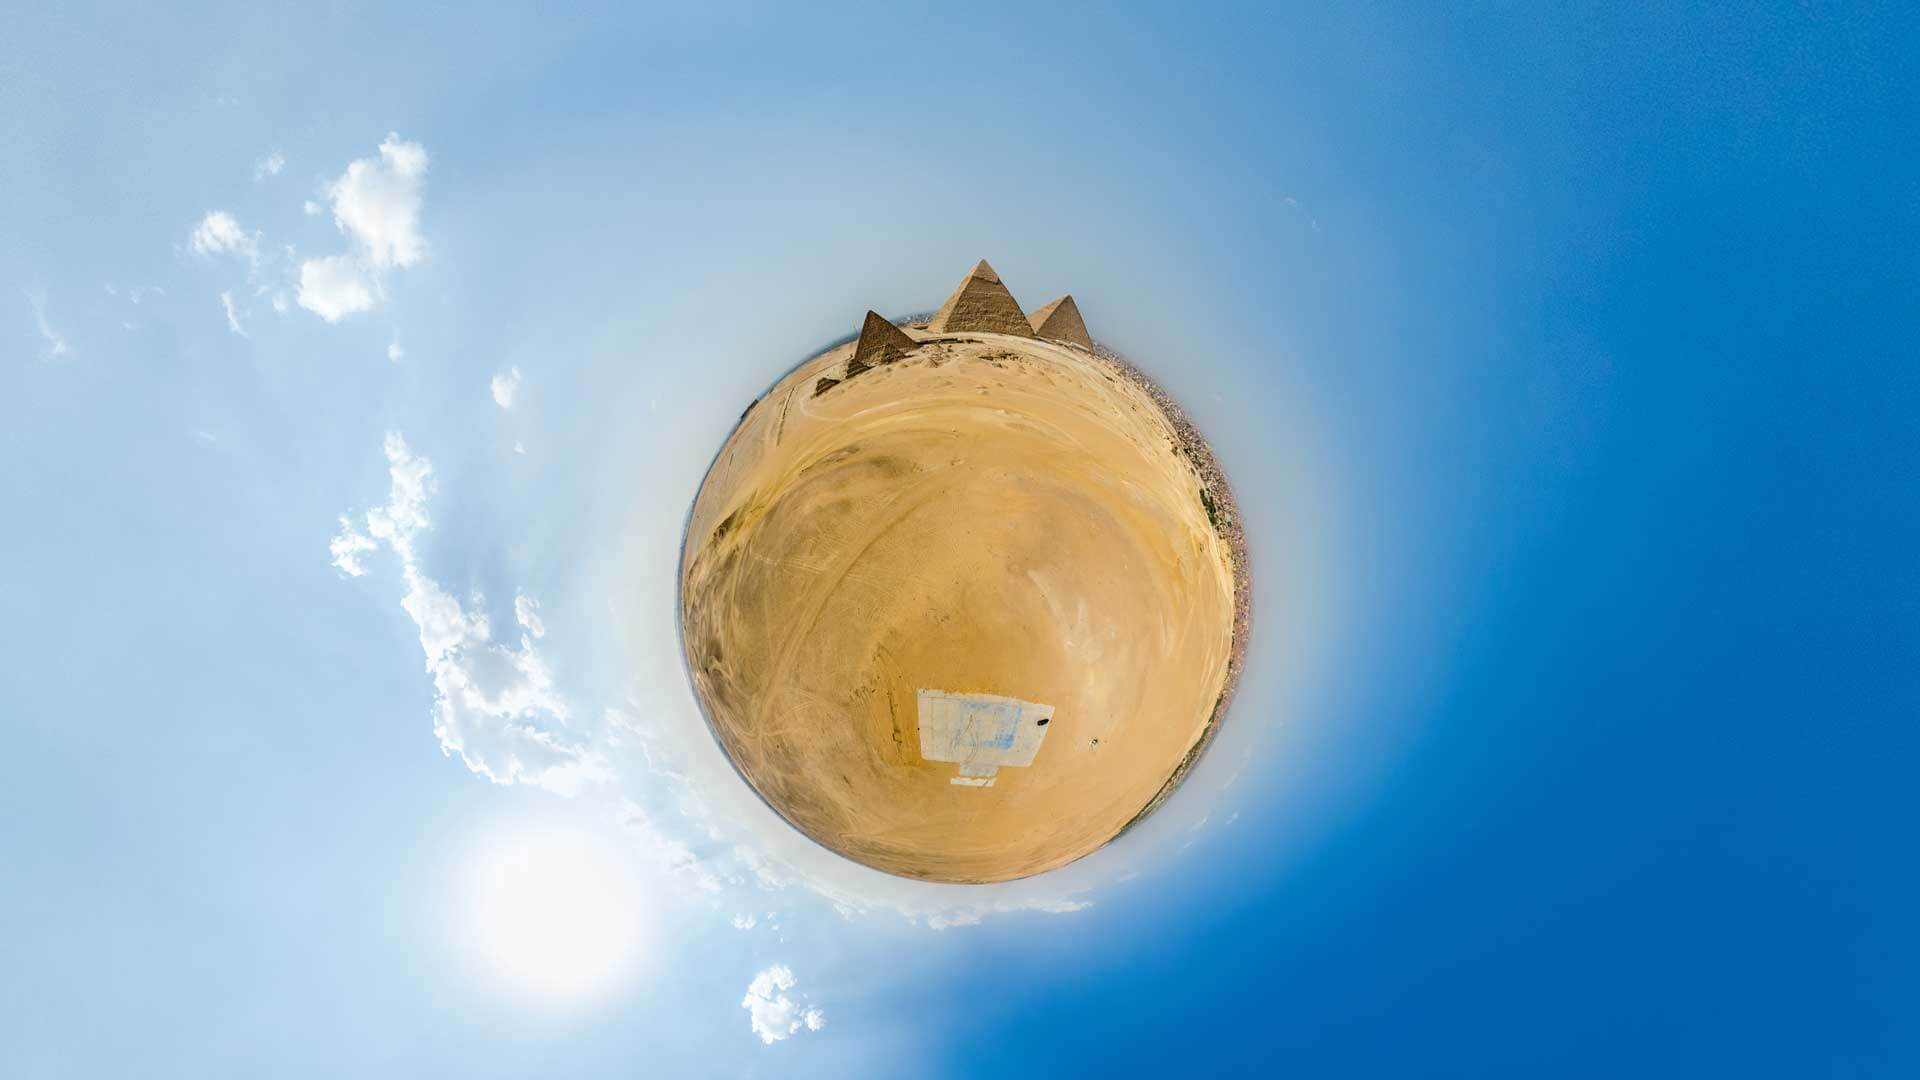 pyramids aerial pano Panorama3 Virtual Reality 360º Production company